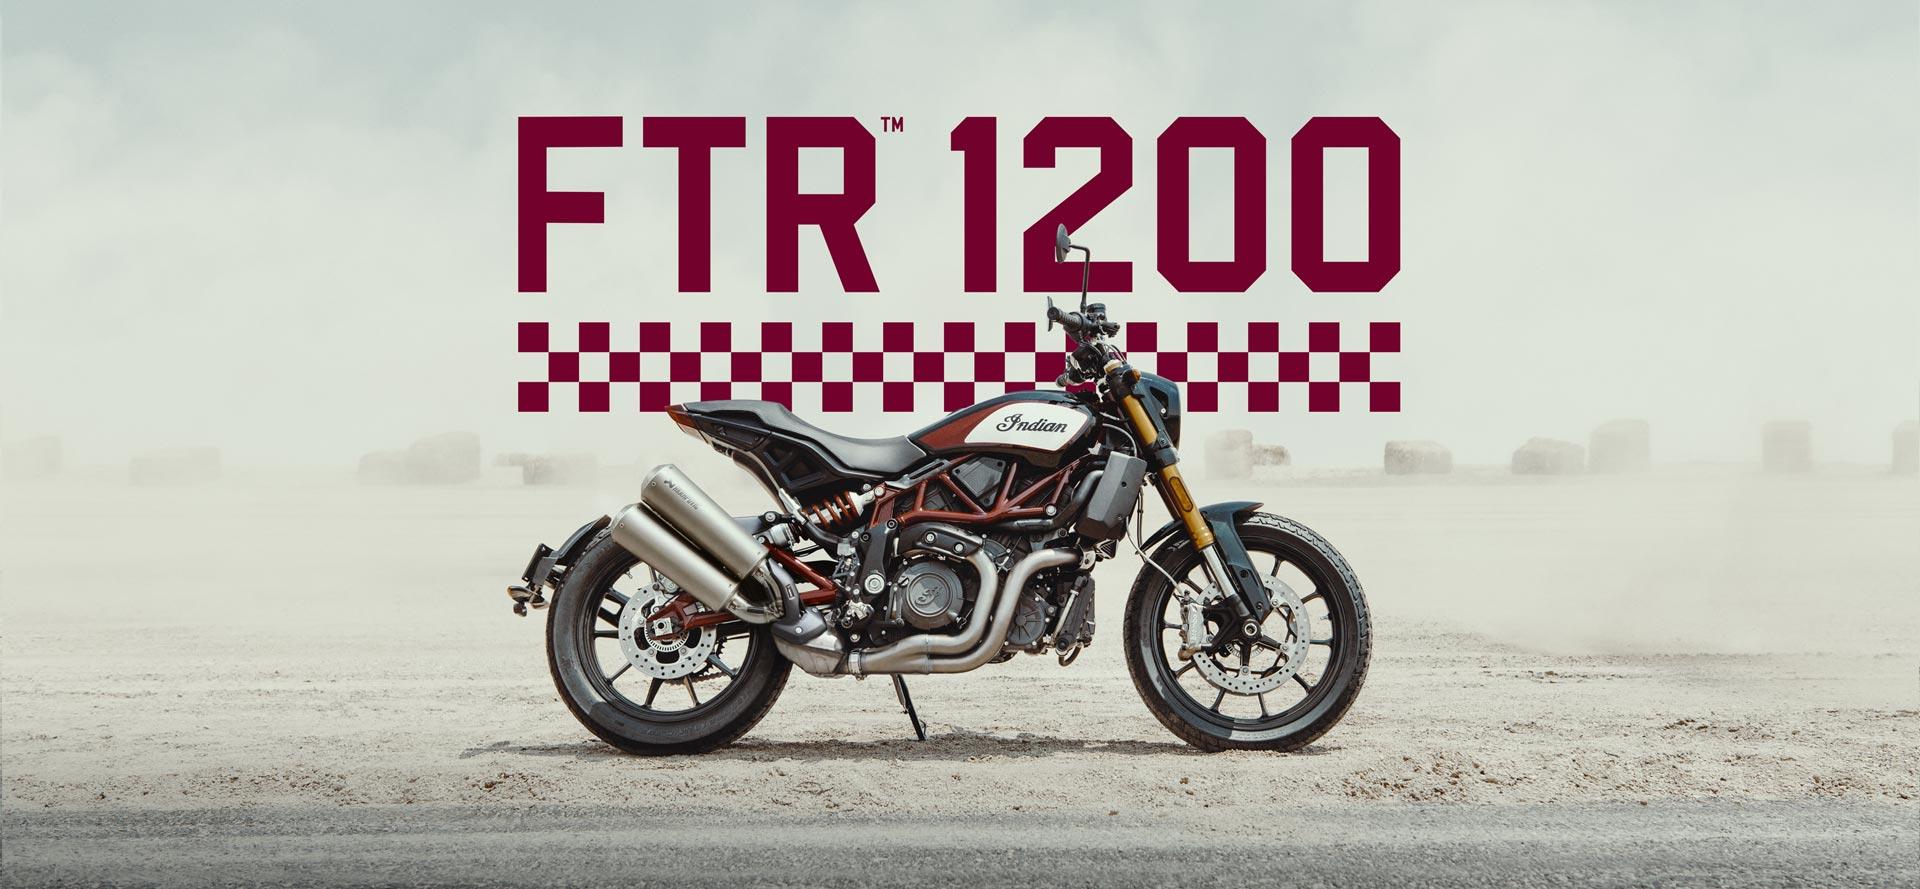 Indian Ftr 1200 >> Indian Motorcycle Suomi Ftr 1200 Family Ftr 1200 Family